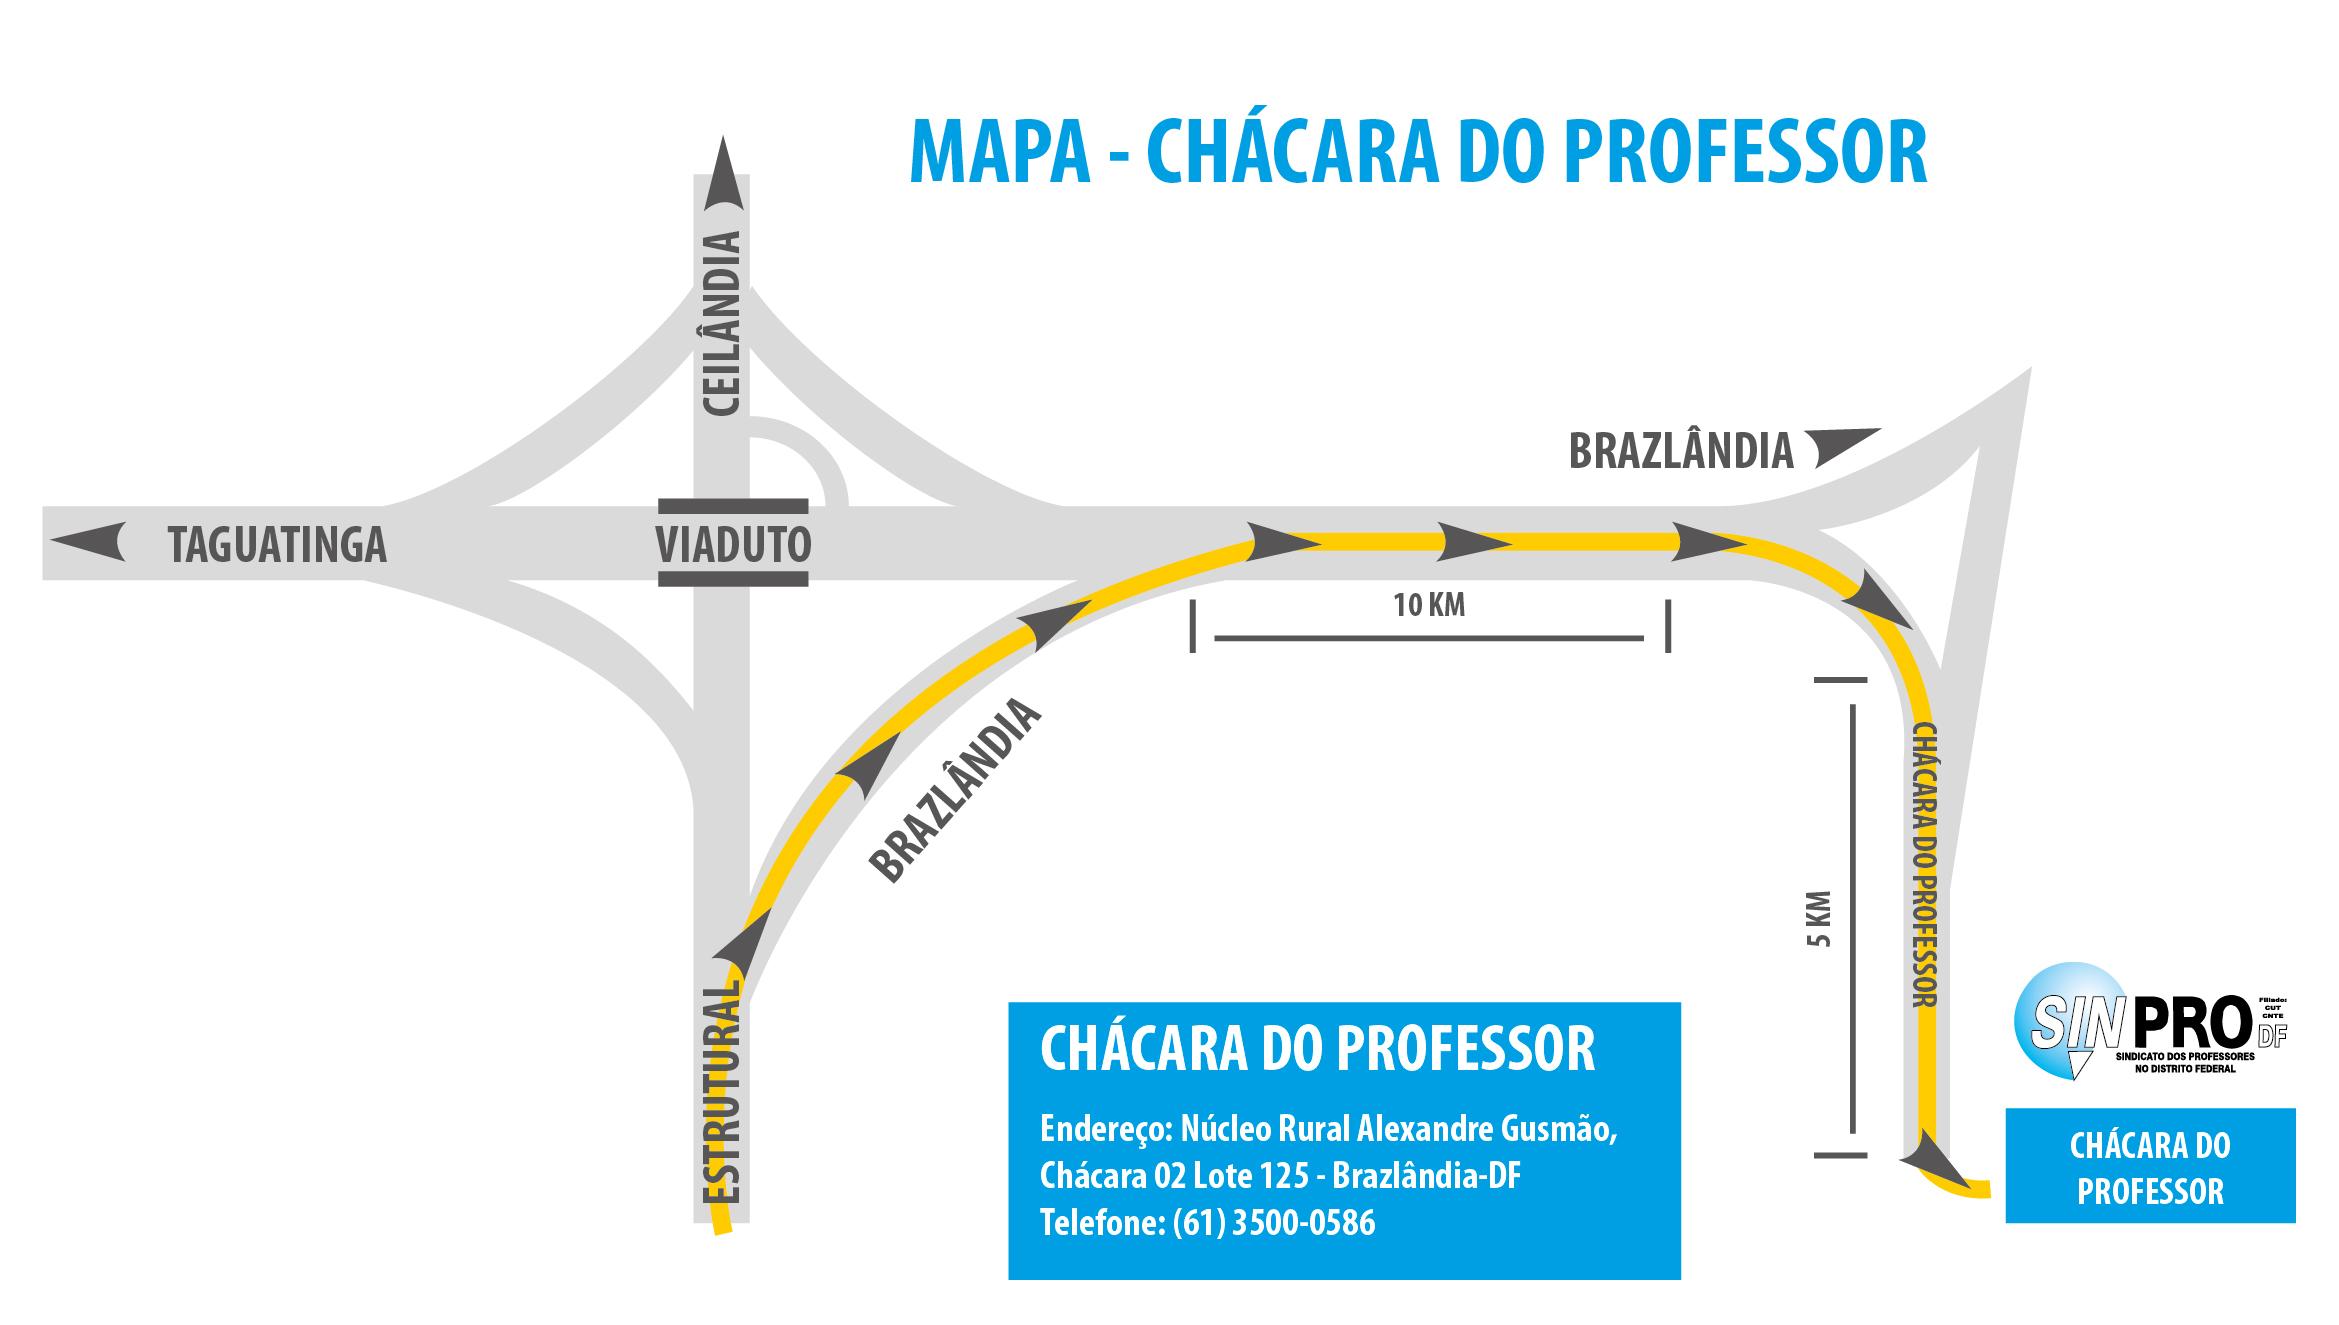 mapa_chacara_professor-01